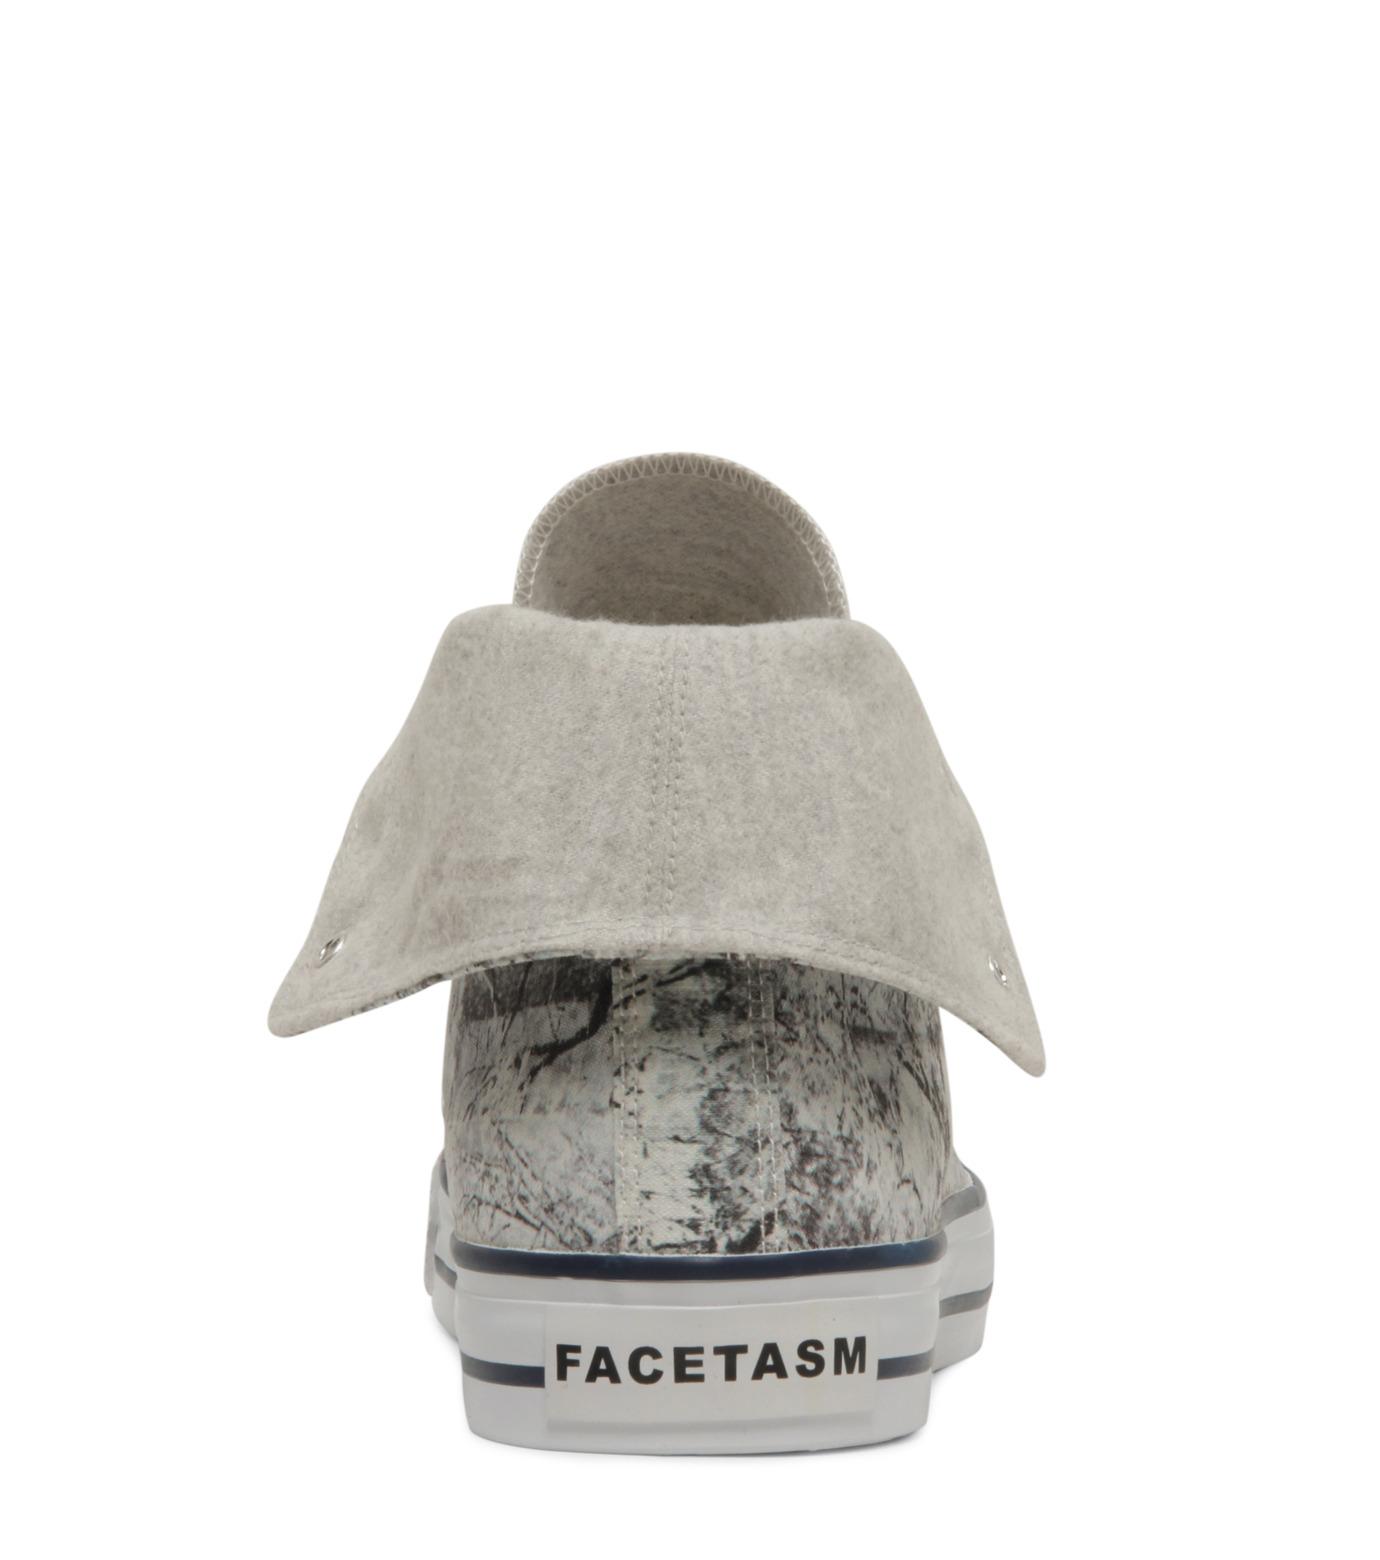 Facetasm(ファセッタズム)のRESTIR EXCLUSIVE SNEAKERS-LIGHT GRAY(シューズ/shoes)-OA-SHO-WS-10 拡大詳細画像5